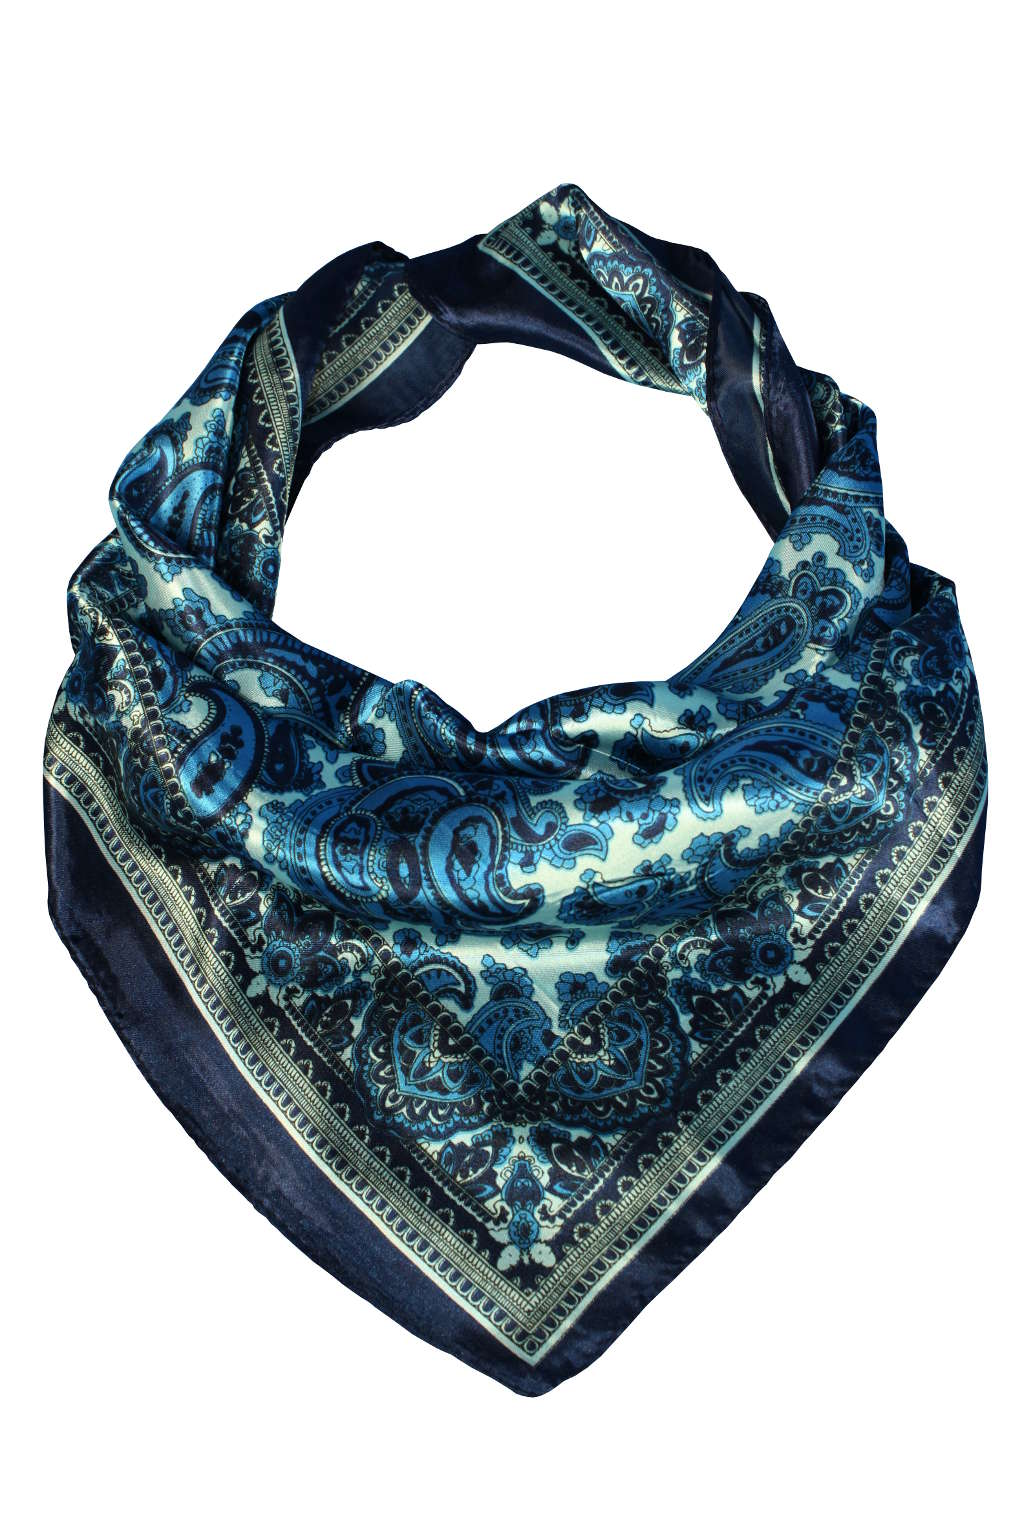 b90cb531cd4 Tmavě modrý šátek. Renesant